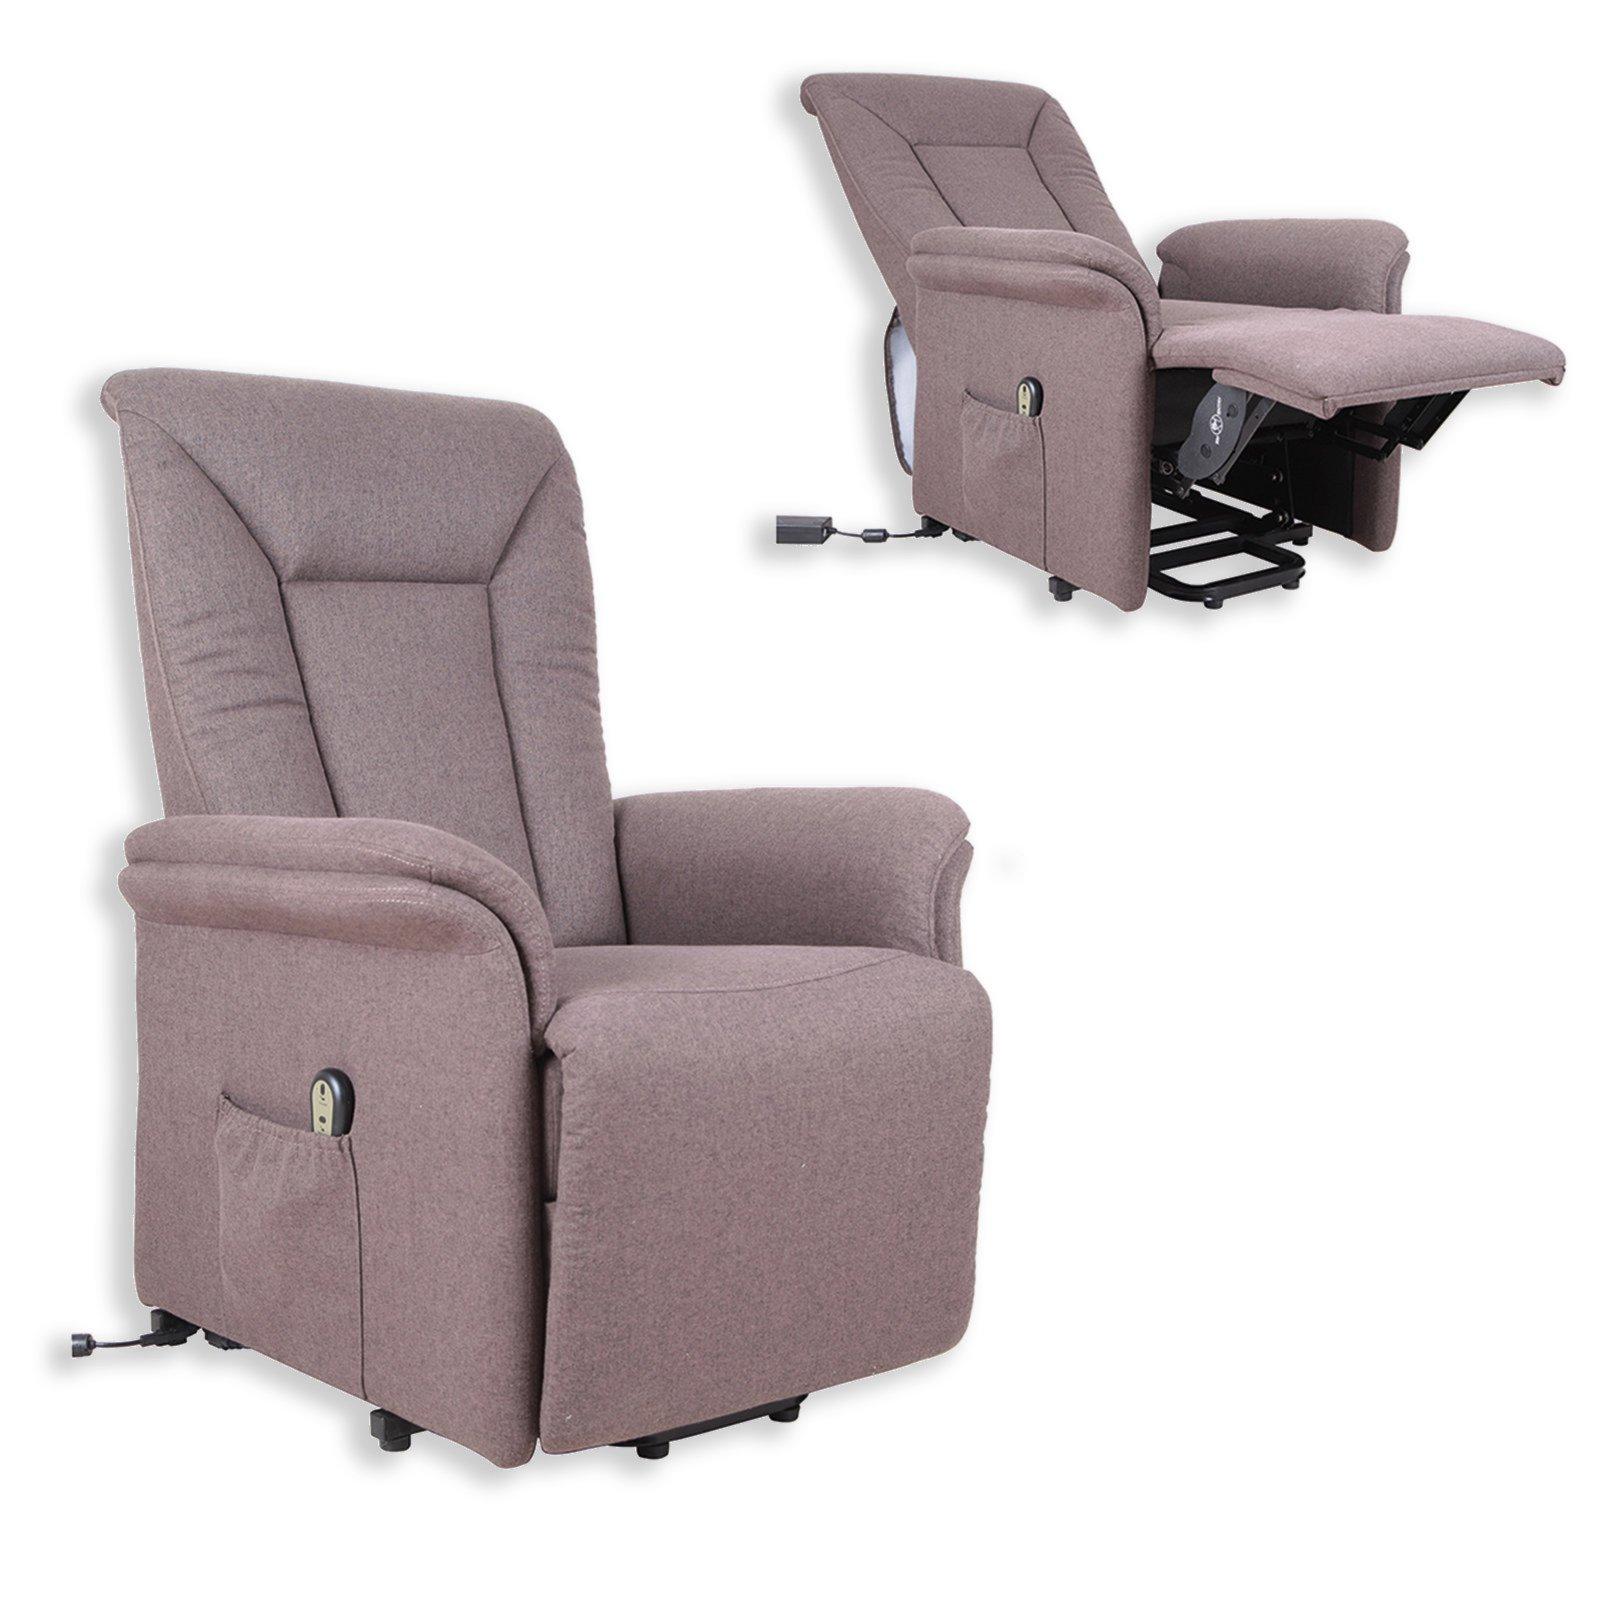 tv sessel braun mit funktionen elektronisch. Black Bedroom Furniture Sets. Home Design Ideas